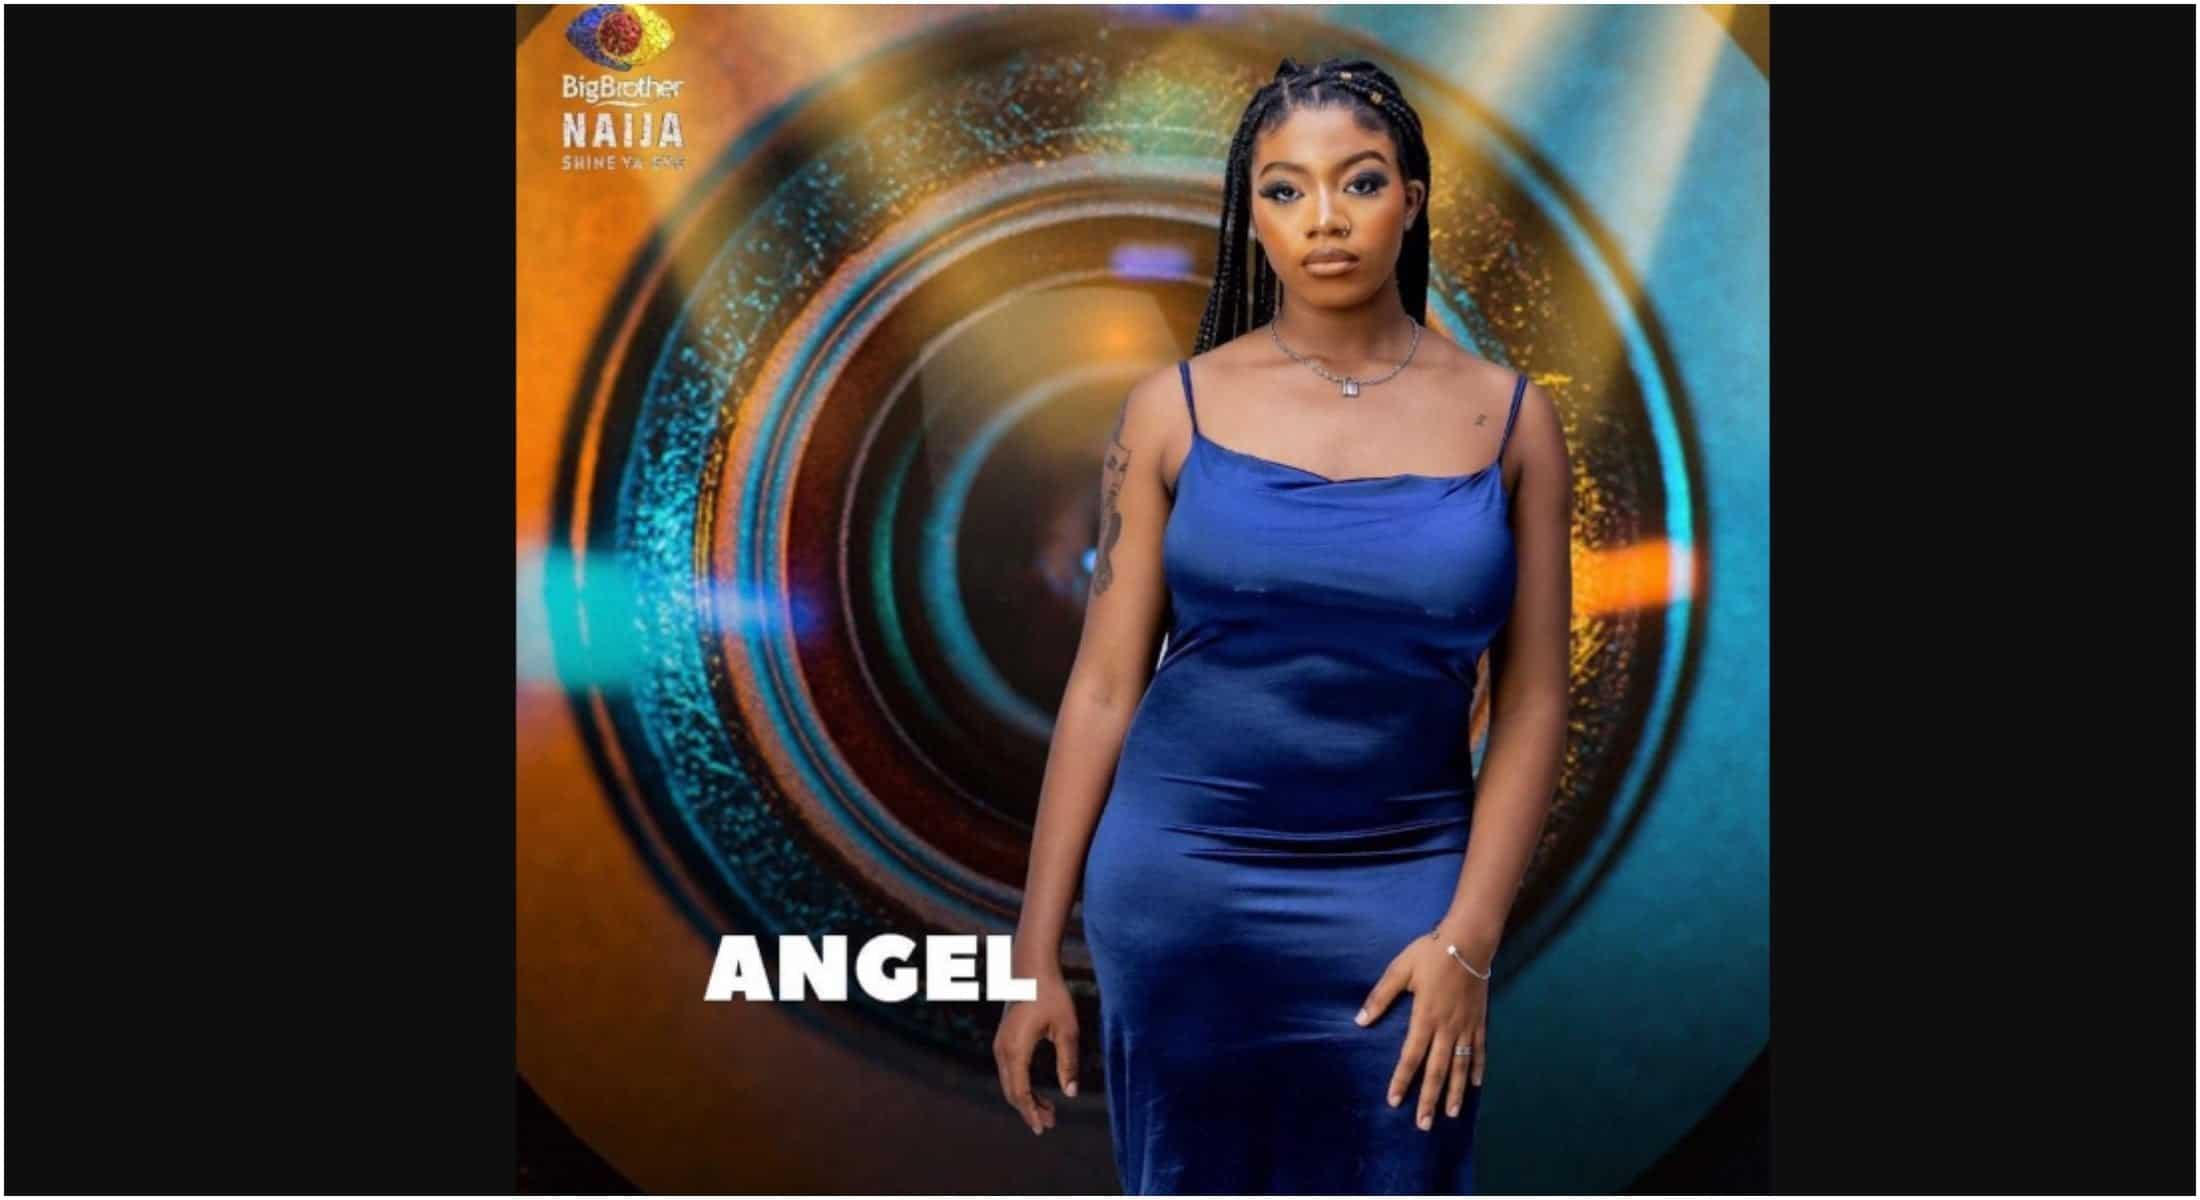 BBNaija Angel's biography, age, parents